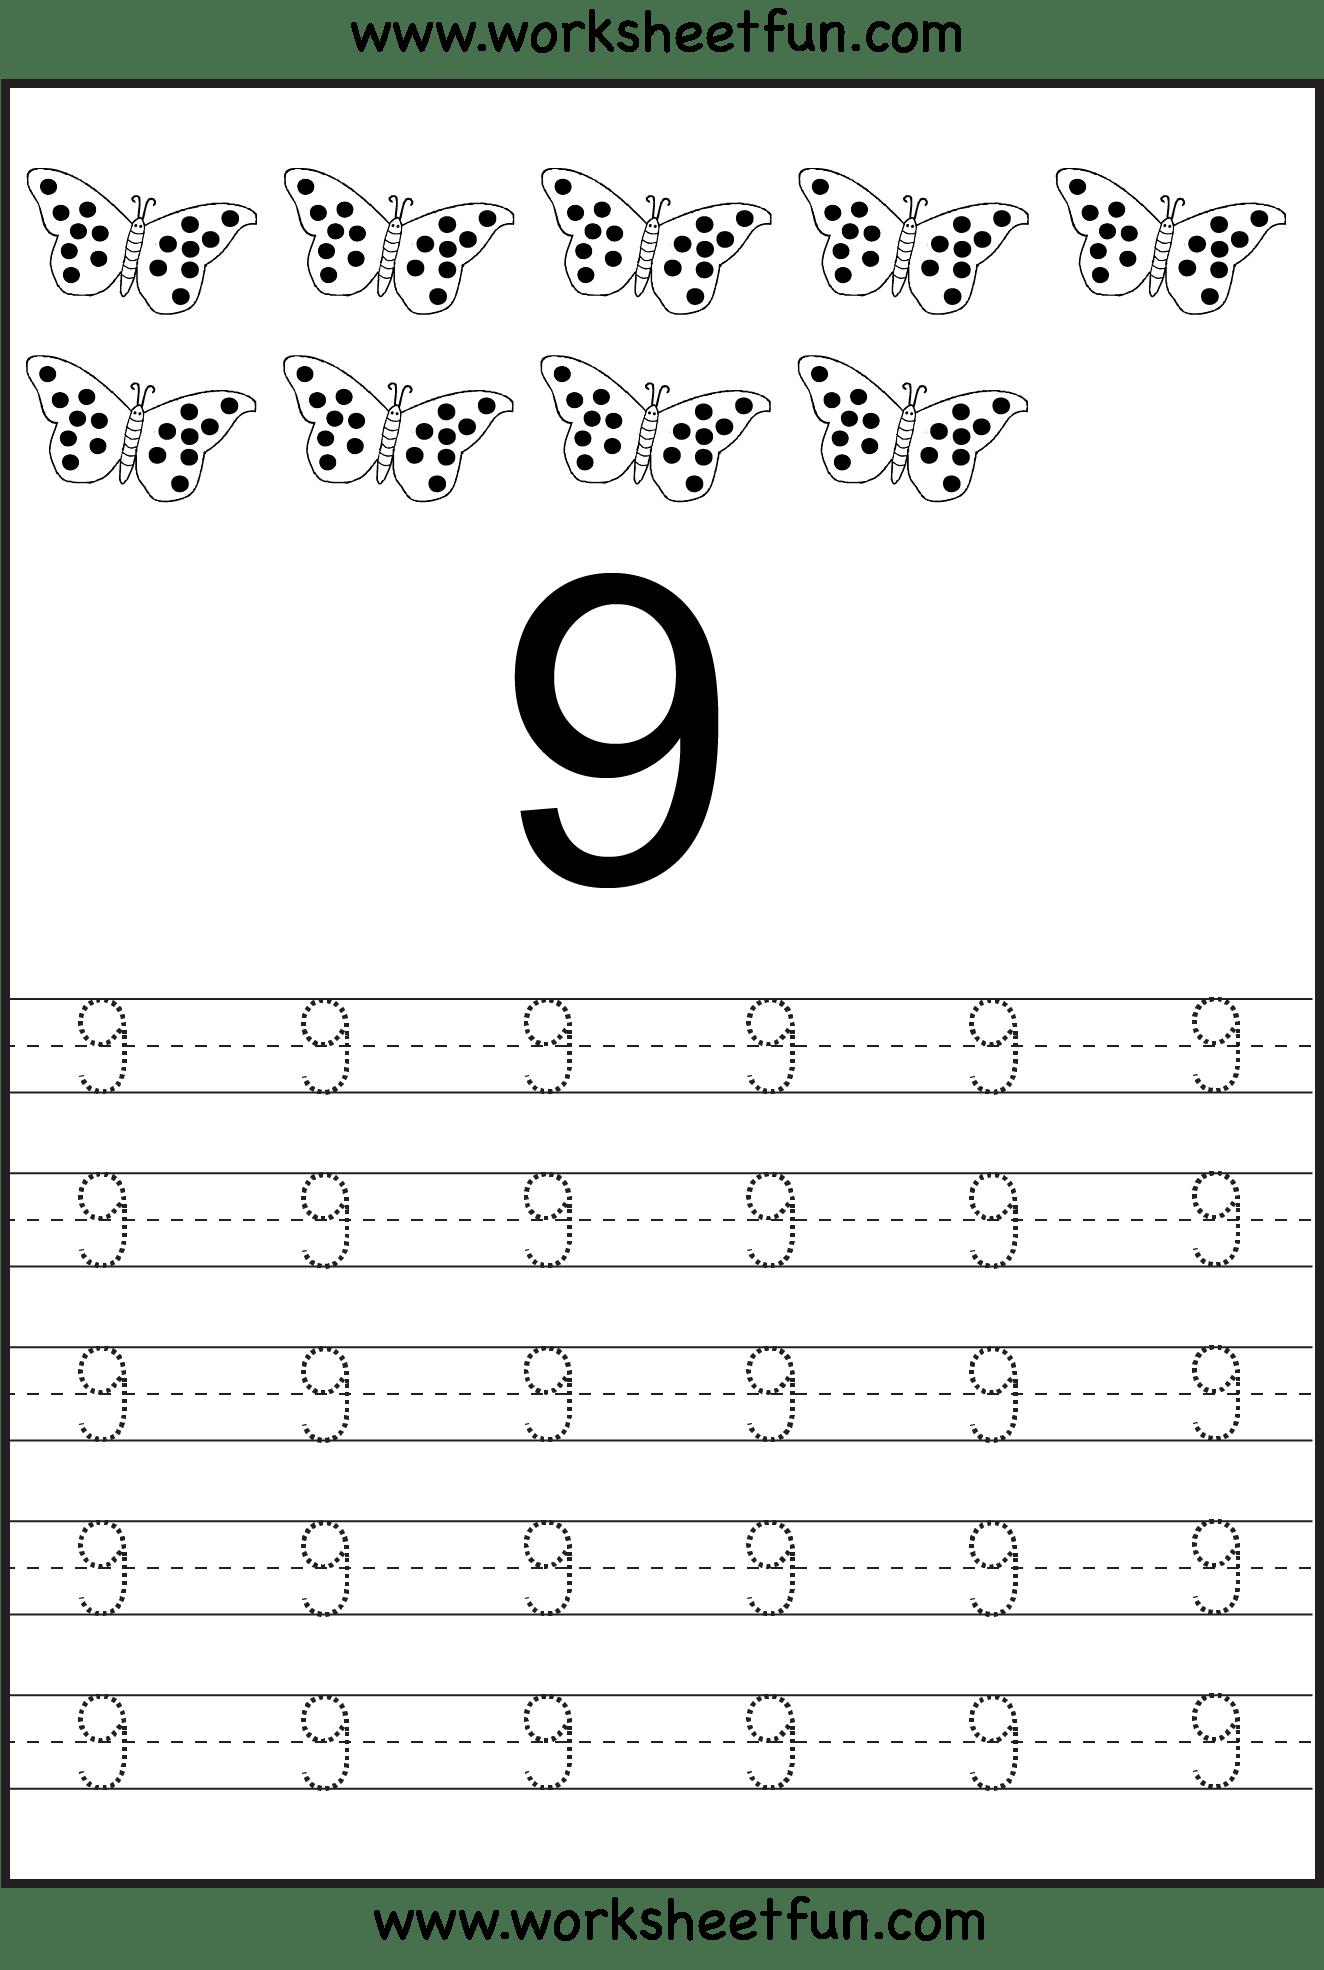 7 Best Images Of 9 Free Printable Number Worksheets